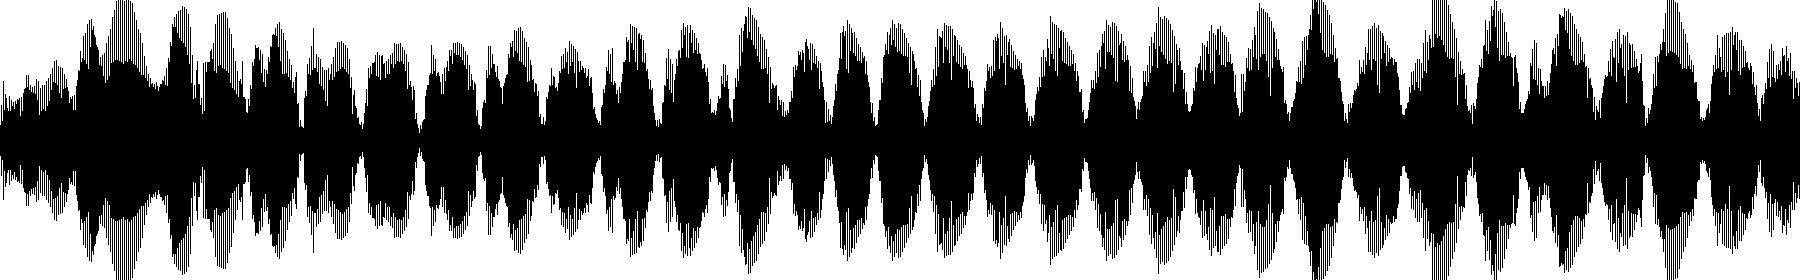 chant 29